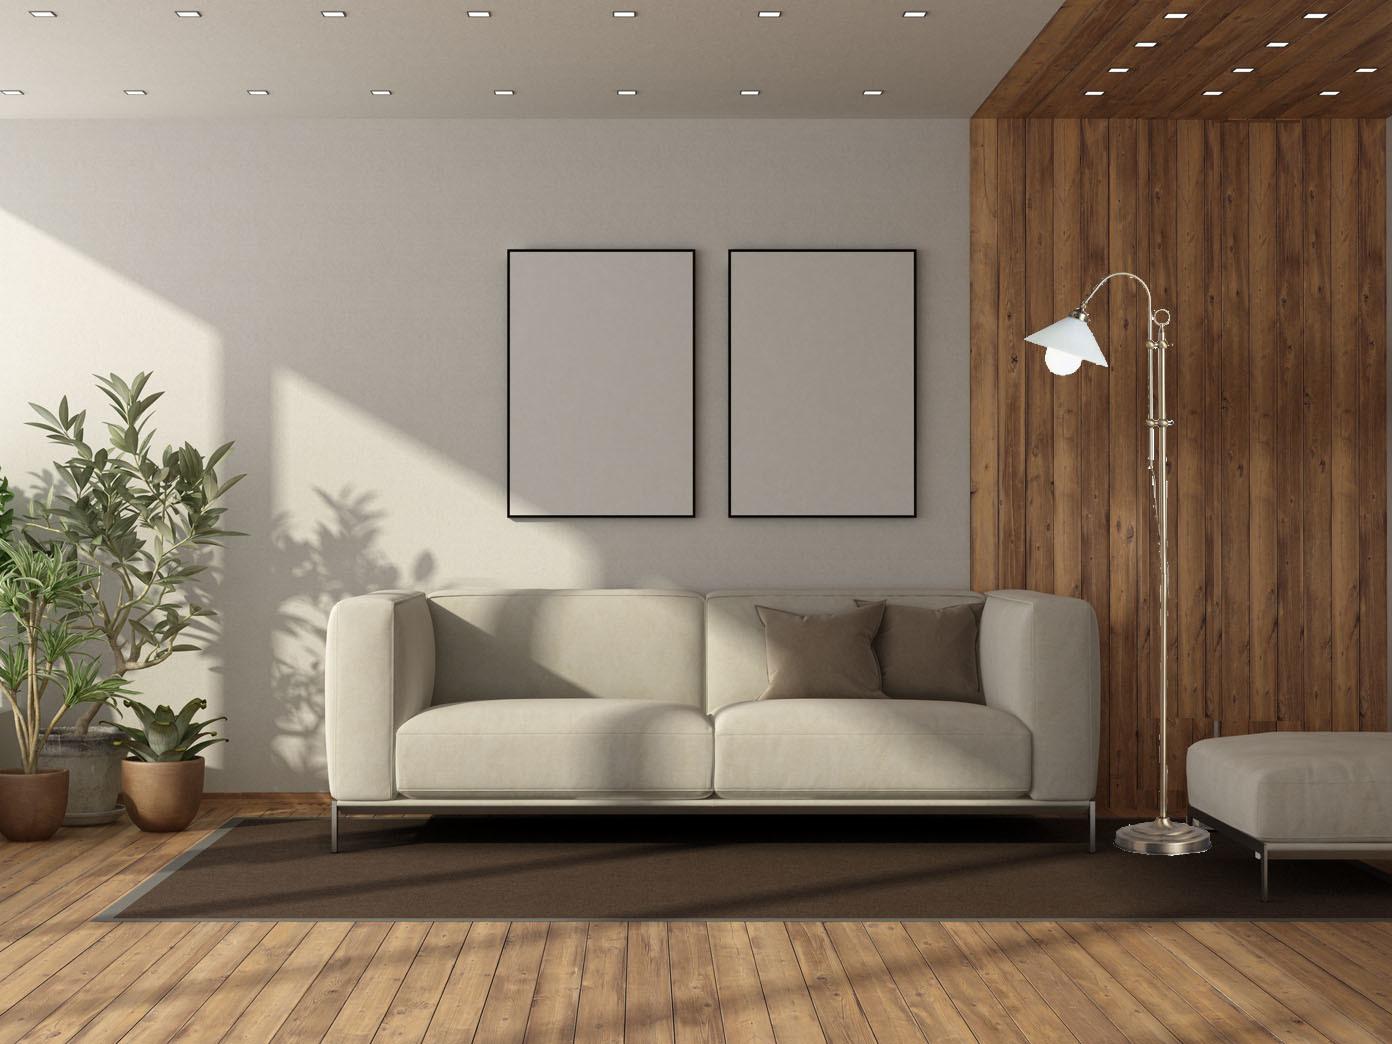 Hoehenverstellbare-Design-LED-Stehlampe-Messing-Glasschirm-Stehleuchte-antik